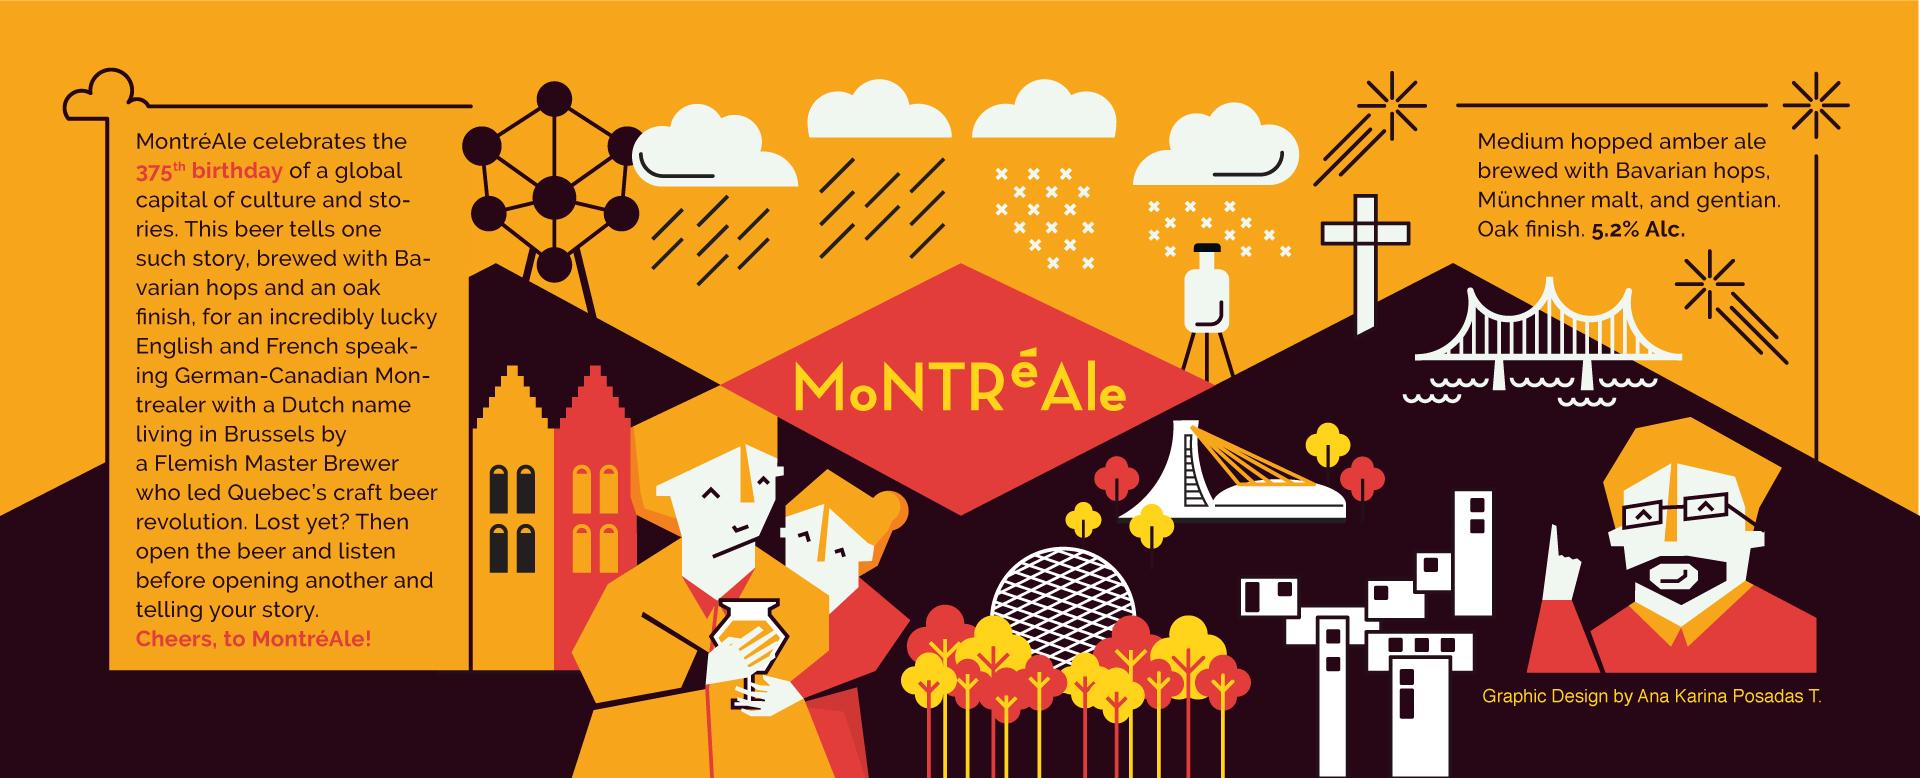 MontrealeBeerLabel©AnaKarinaPosadasTerán